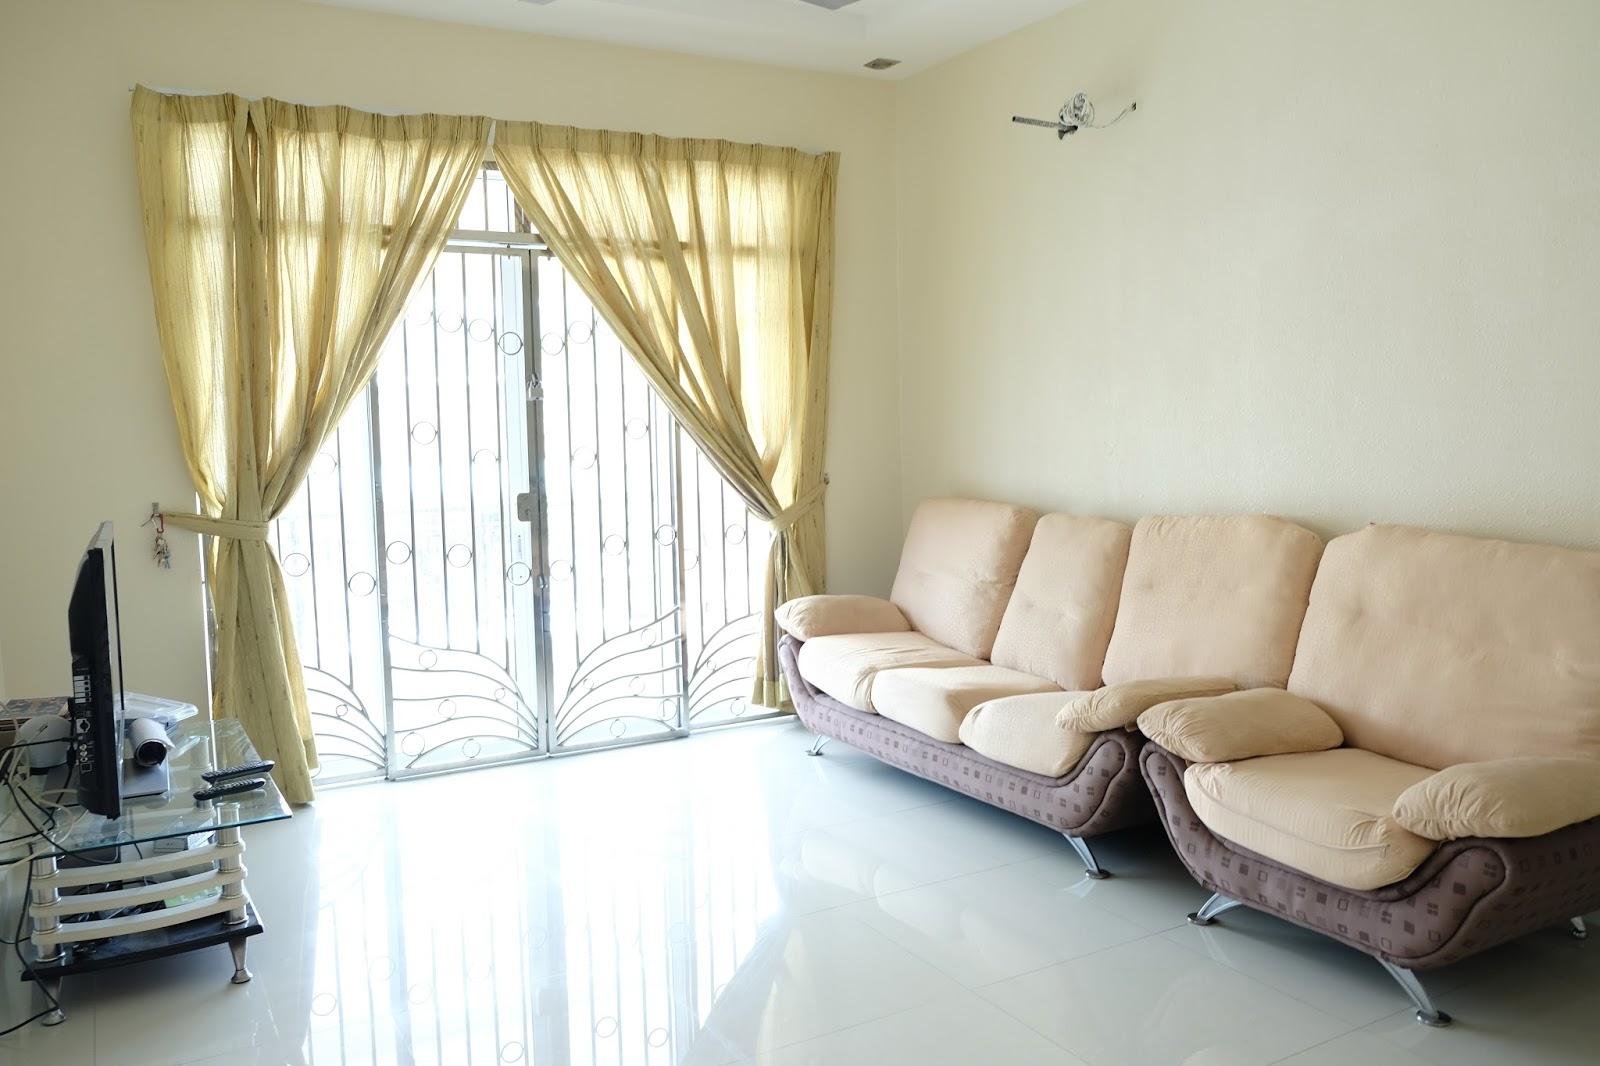 Penang Homestay 說到檳城的民宿怎么少得了這間?太便宜了!有得唱卡拉OK,打桌球還可以住上至少十個人而一晚 ...